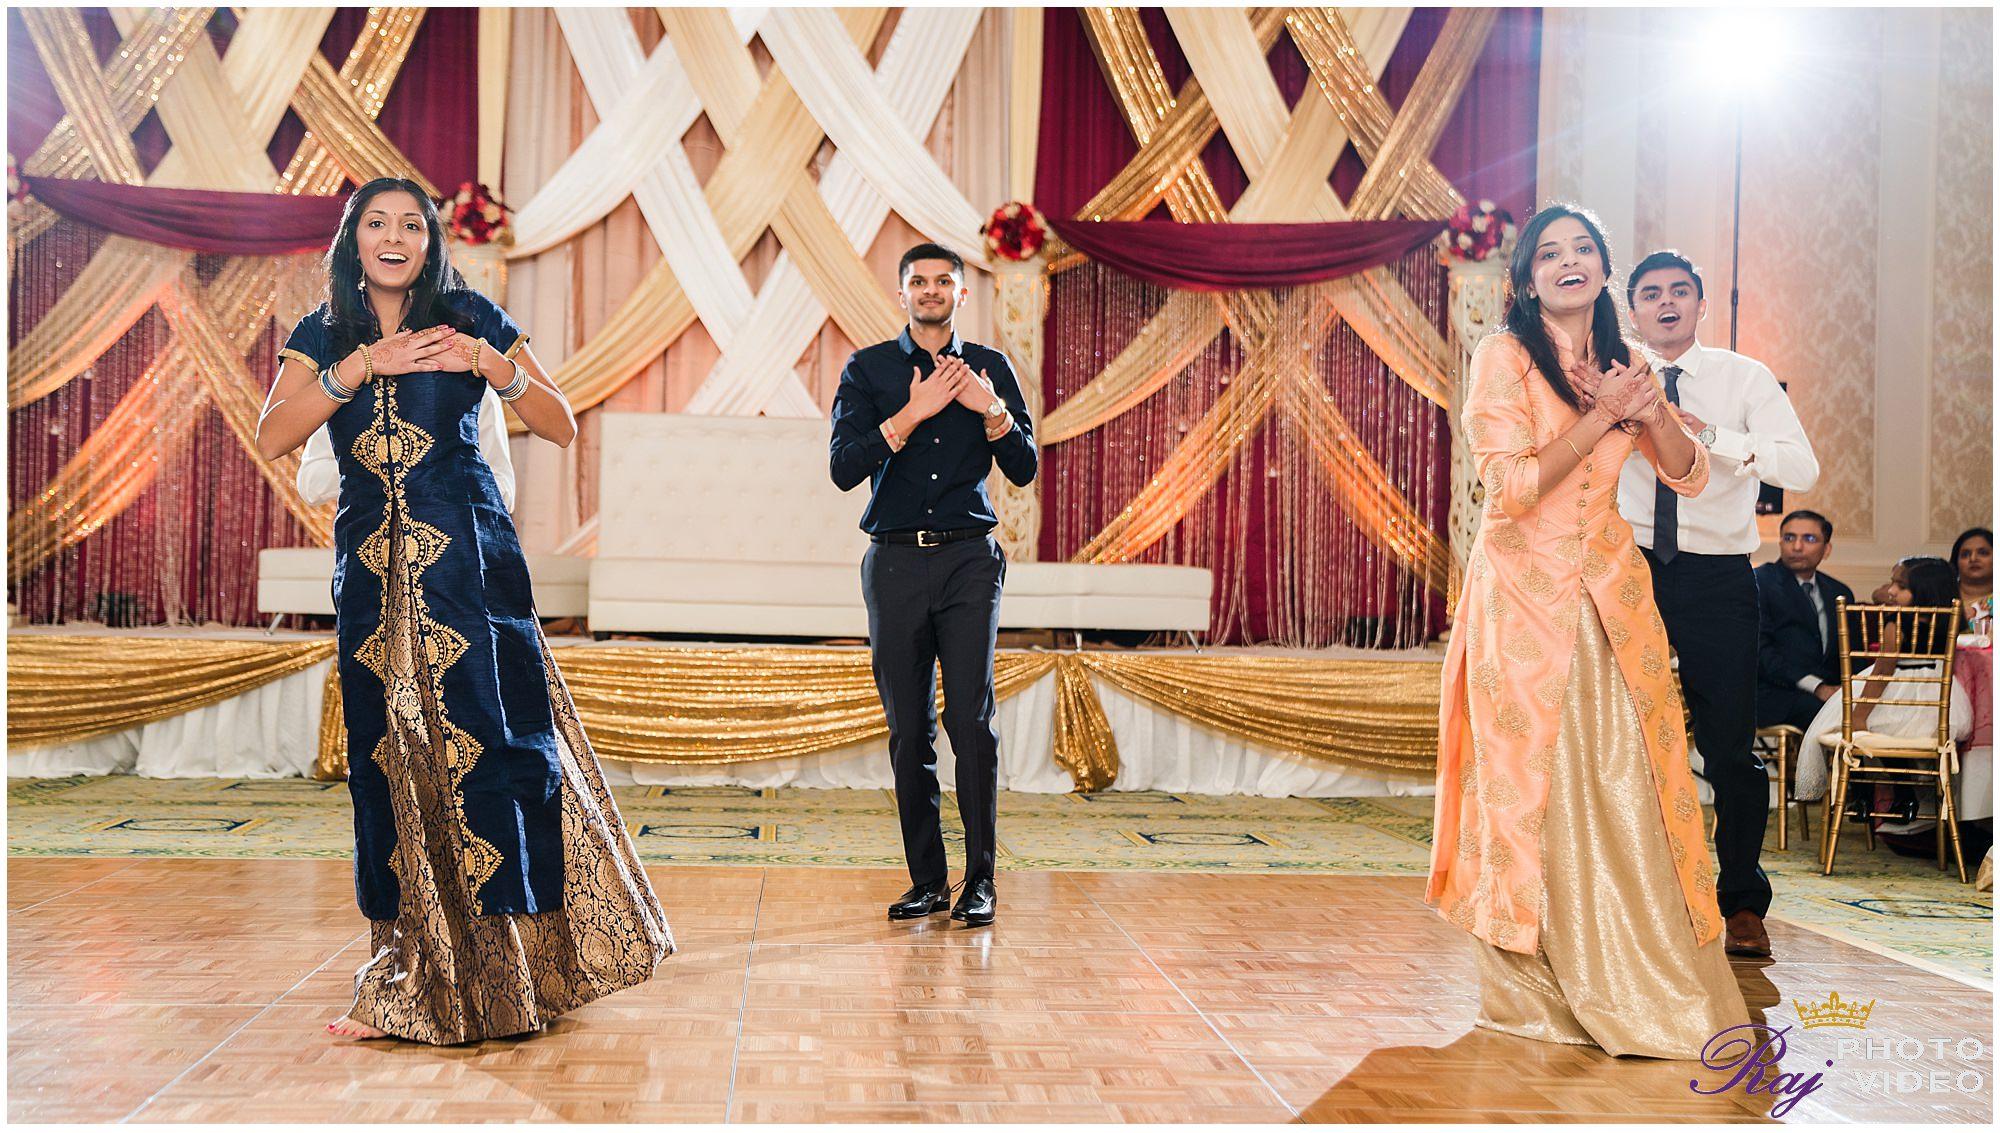 Founders-Inn-and-Spa-Virginia-Beach-VA-Indian-Wedding-Harini-Vivek-86.jpg